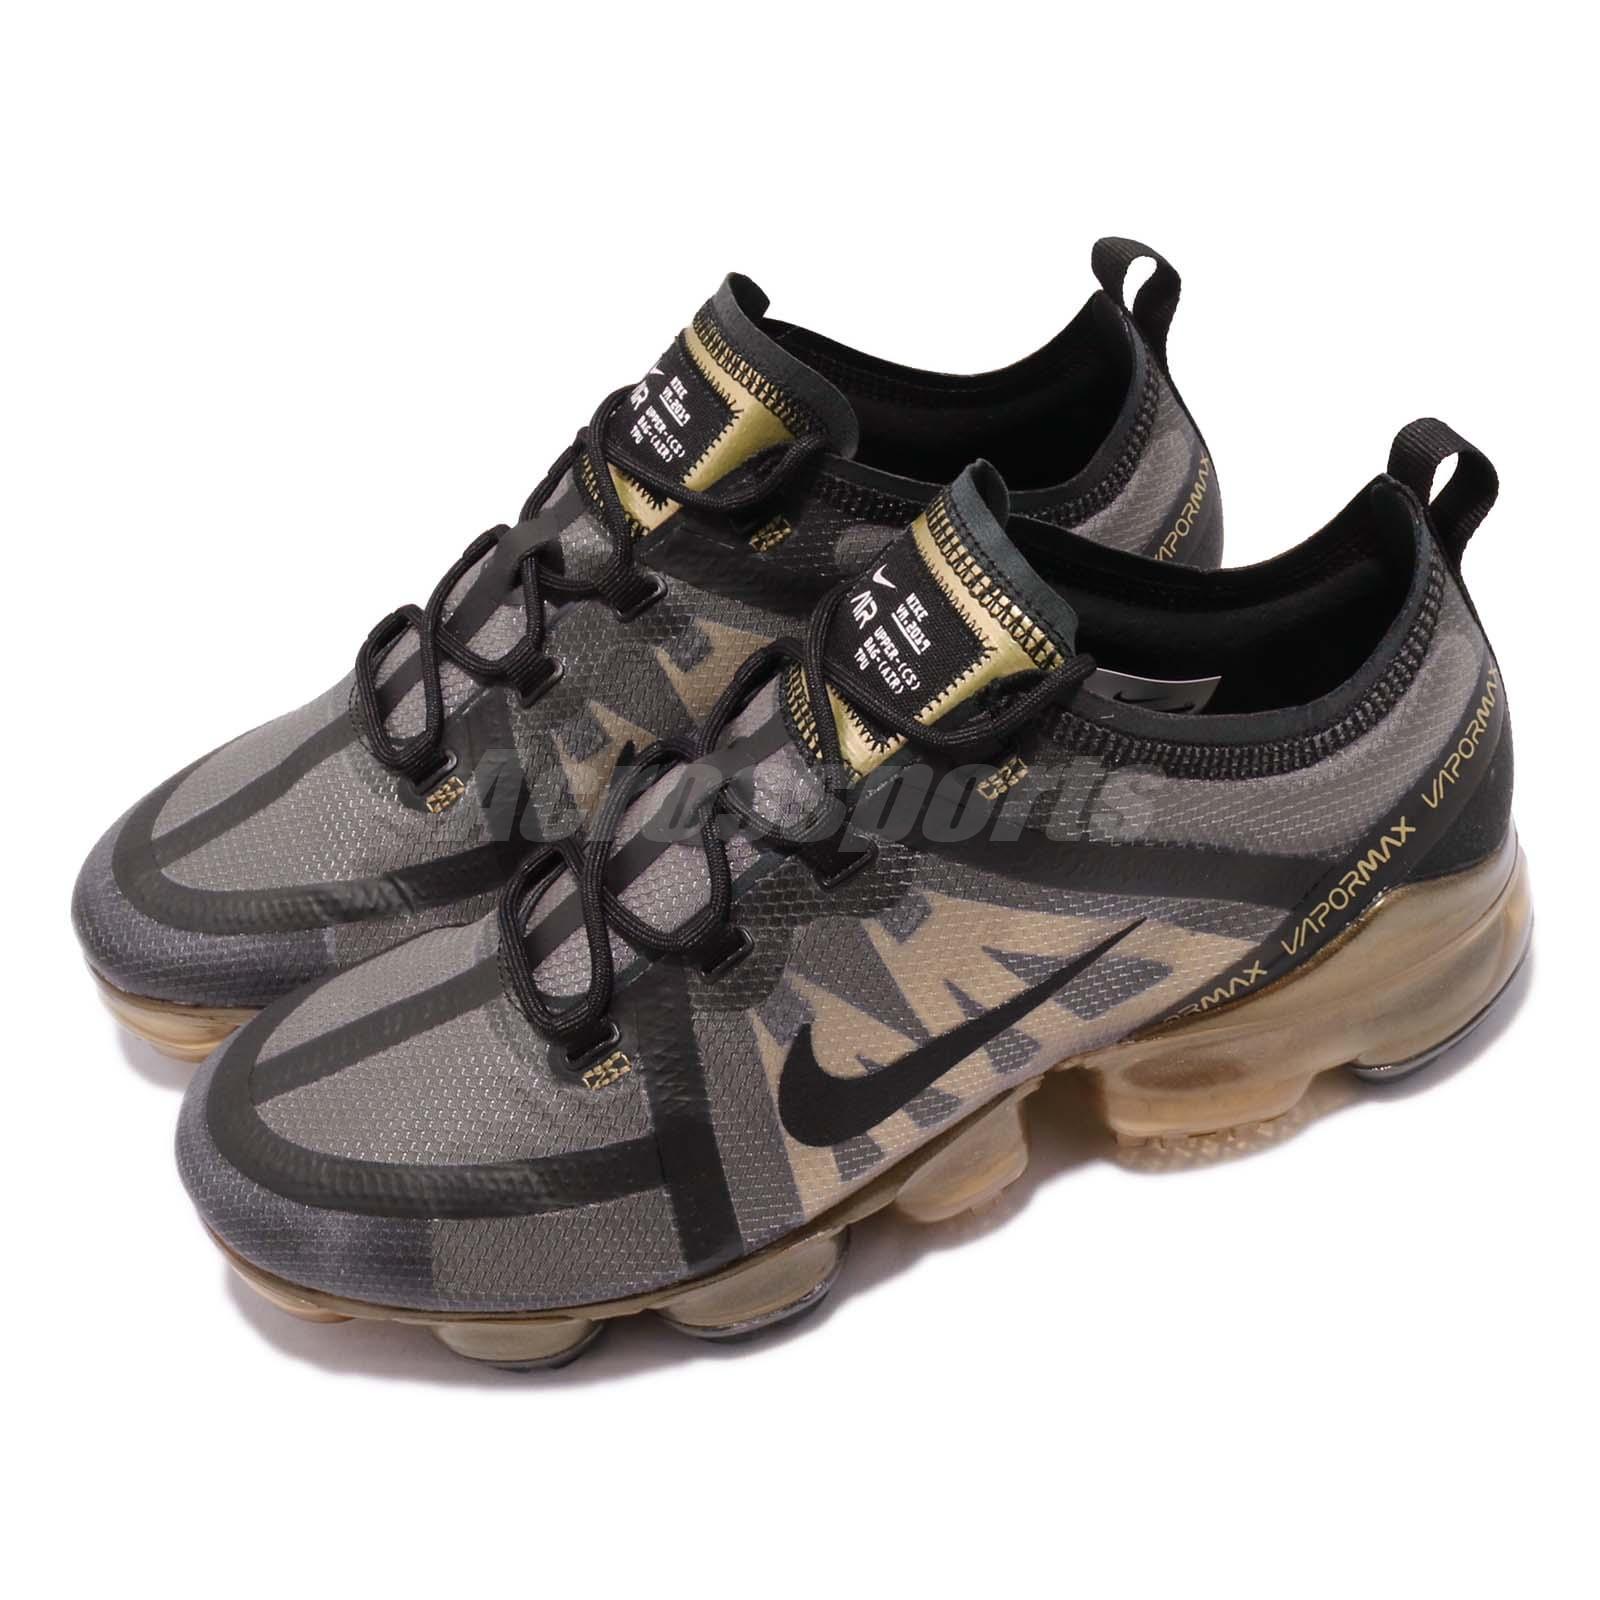 Nike Air Vapormax 2019 Black Gold Max Mens Running Shoes ...